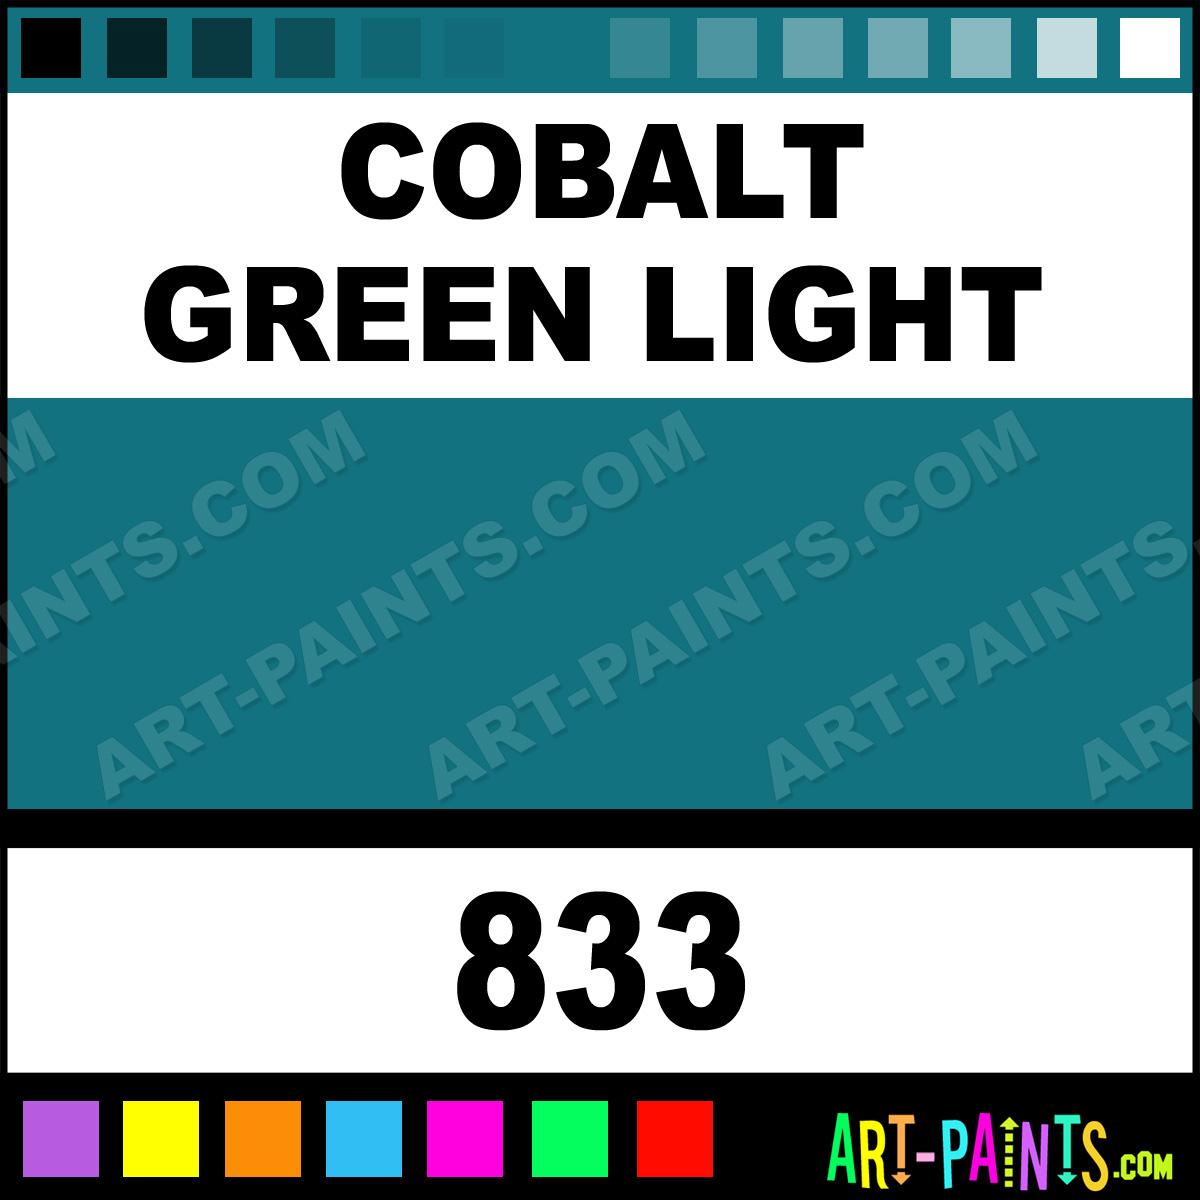 Cobalt green light oil sticks oil paints 833 cobalt for Will oil paint stick to glass